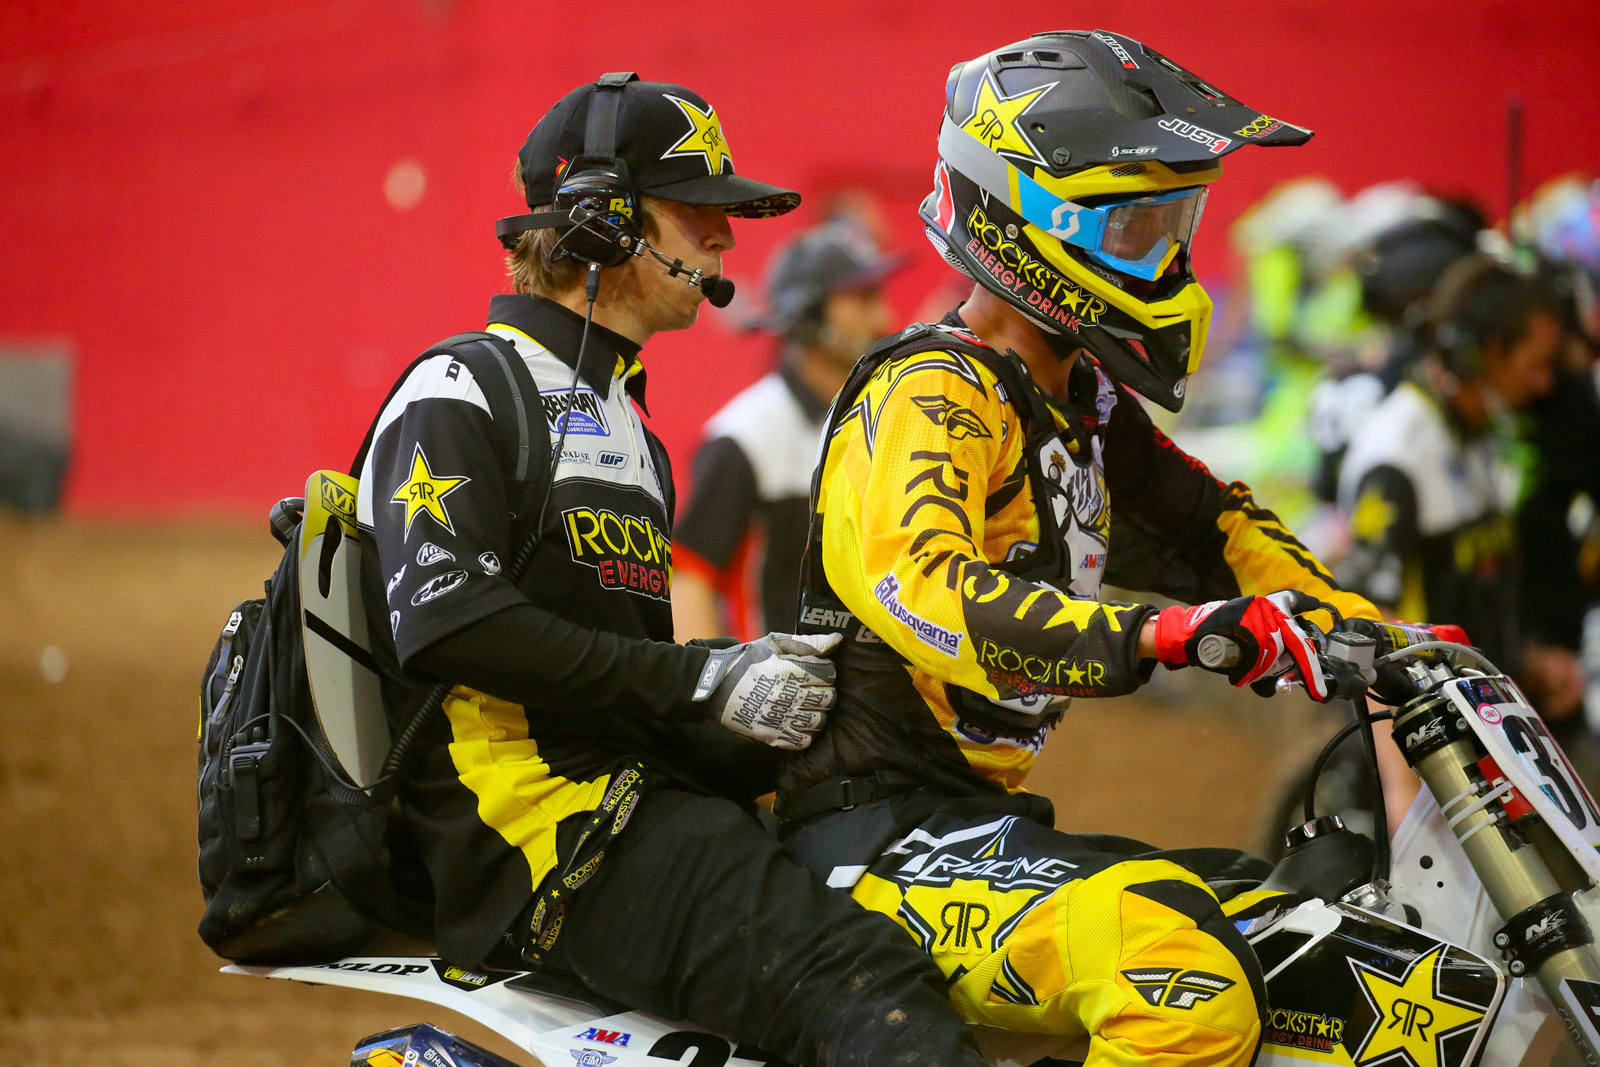 Christophe Pourcel and Daniel Castloo - Vital MX Pit Bits: Glendale - Motocross Pictures - Vital MX